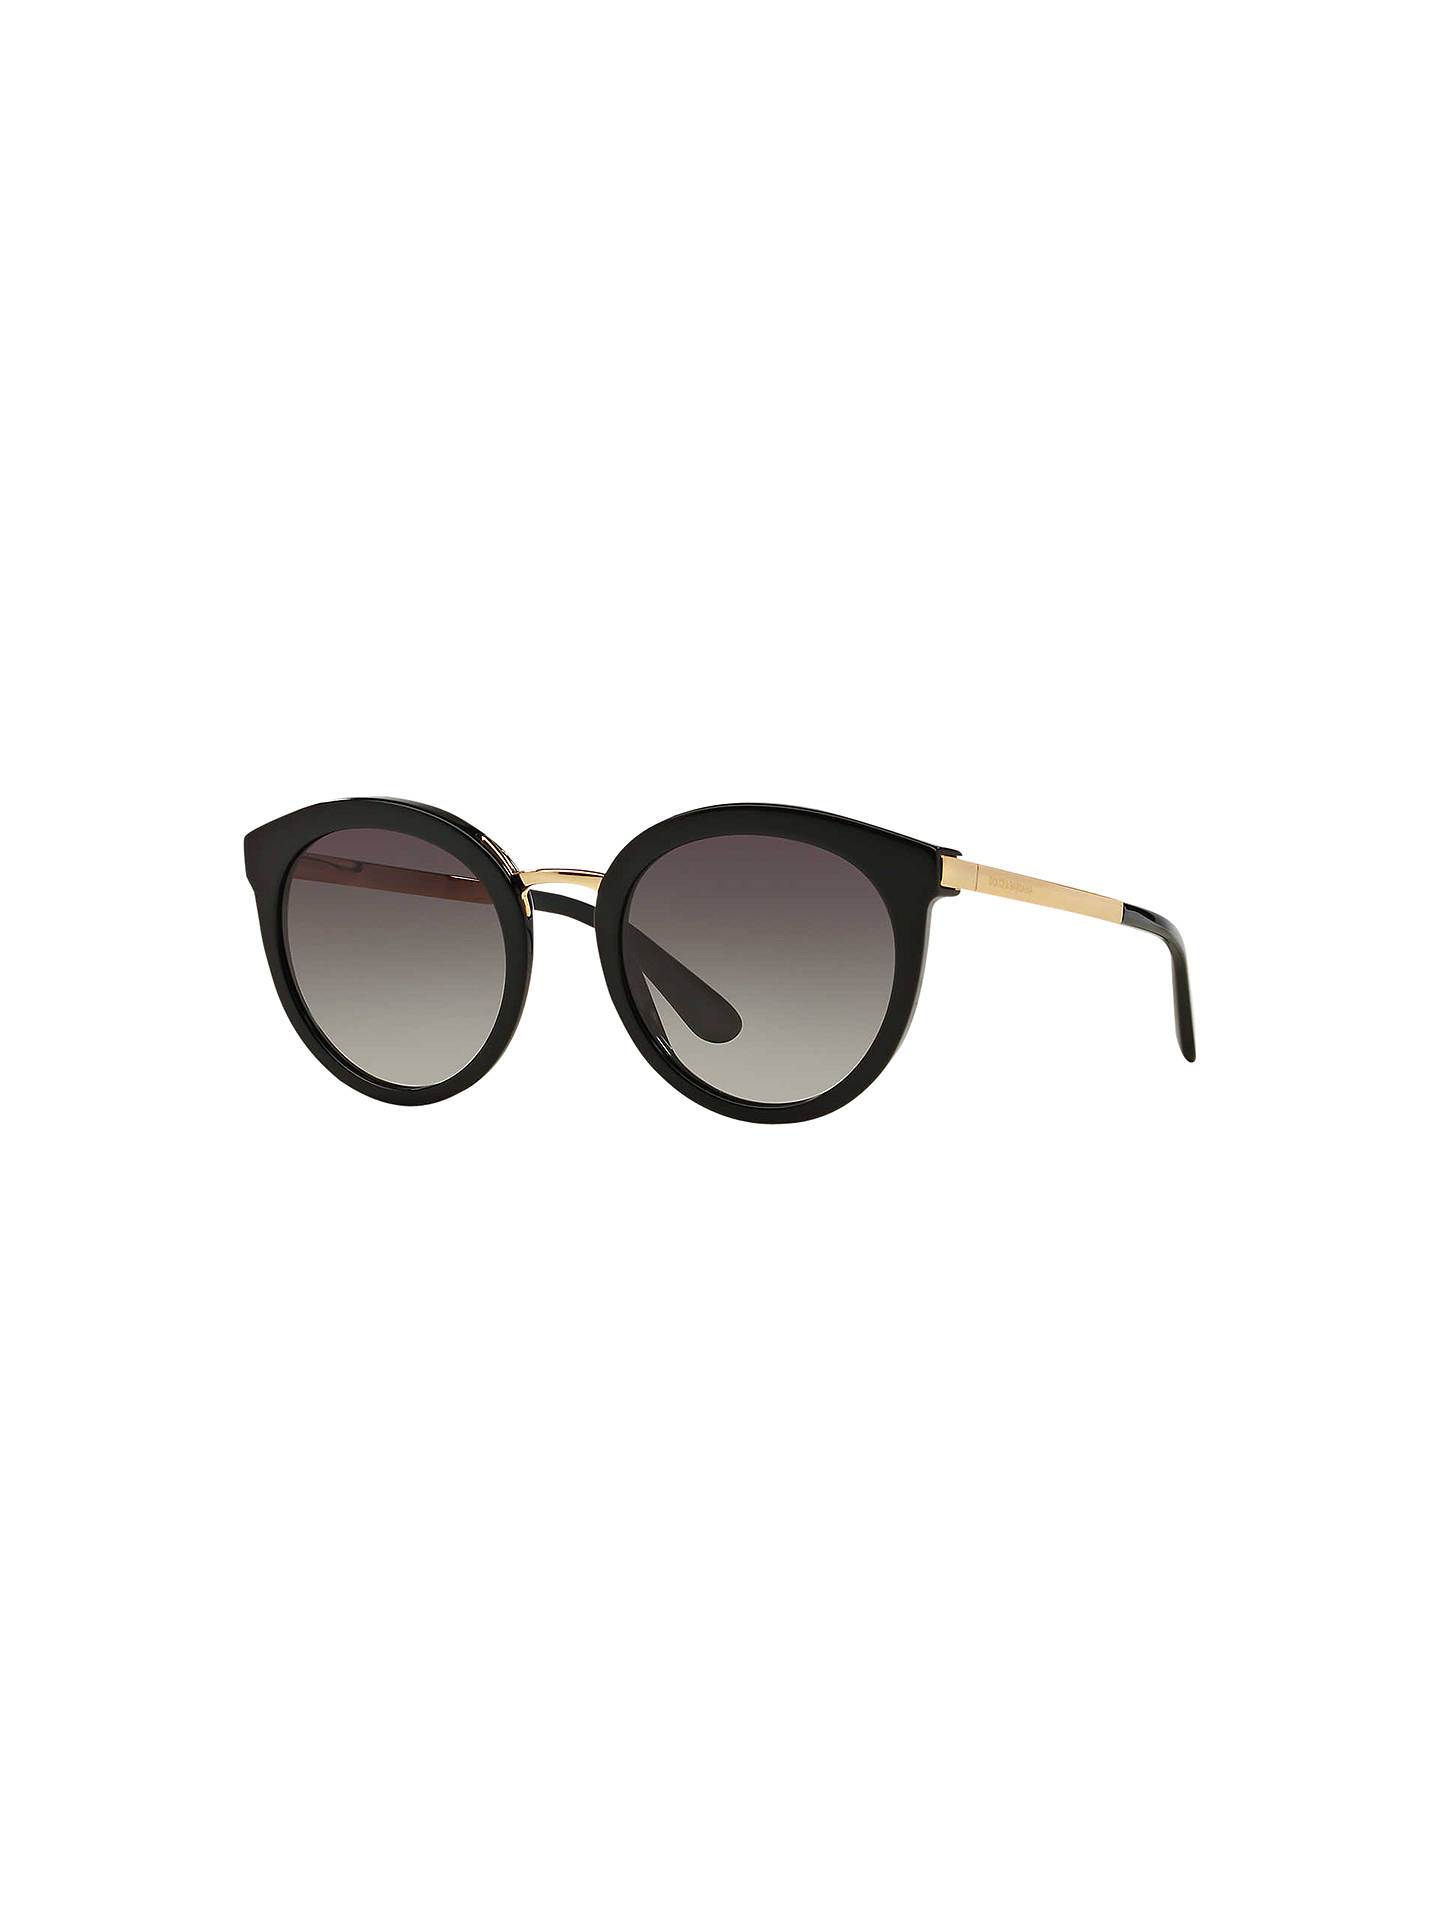 142b5698ee88 Dolce   Gabbana DG4268 Round Sunglasses at John Lewis   Partners